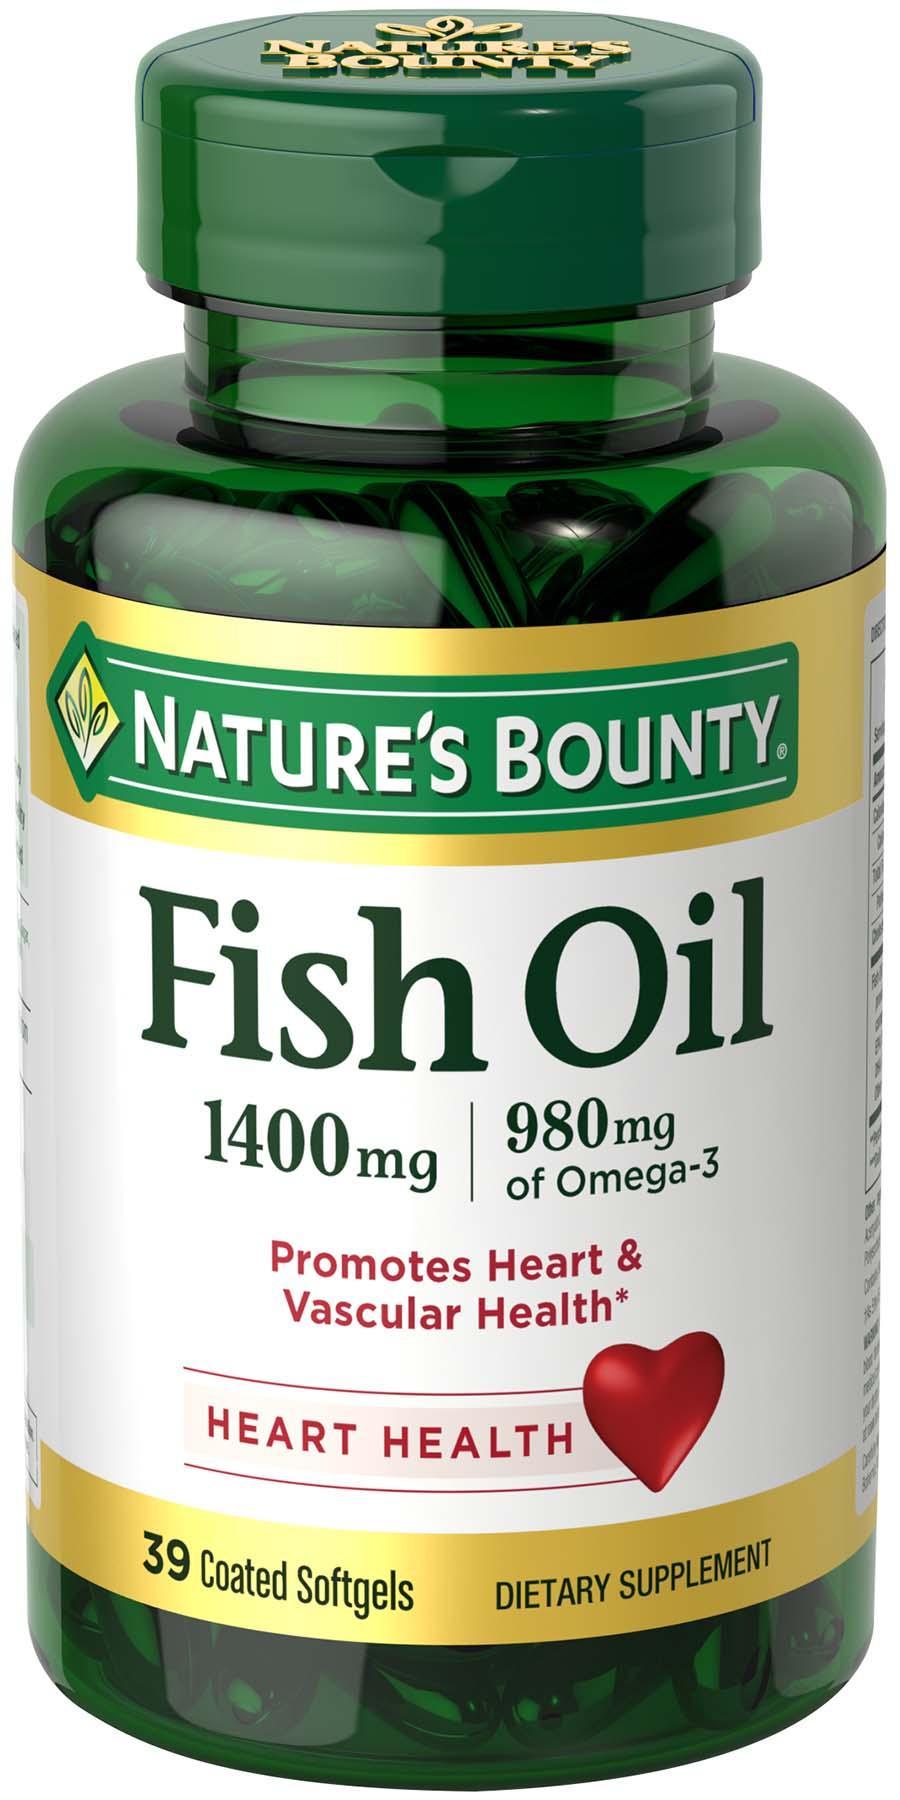 Nature 39 s bounty fish oil 1400 mg omega 3 for Fish oil alternative